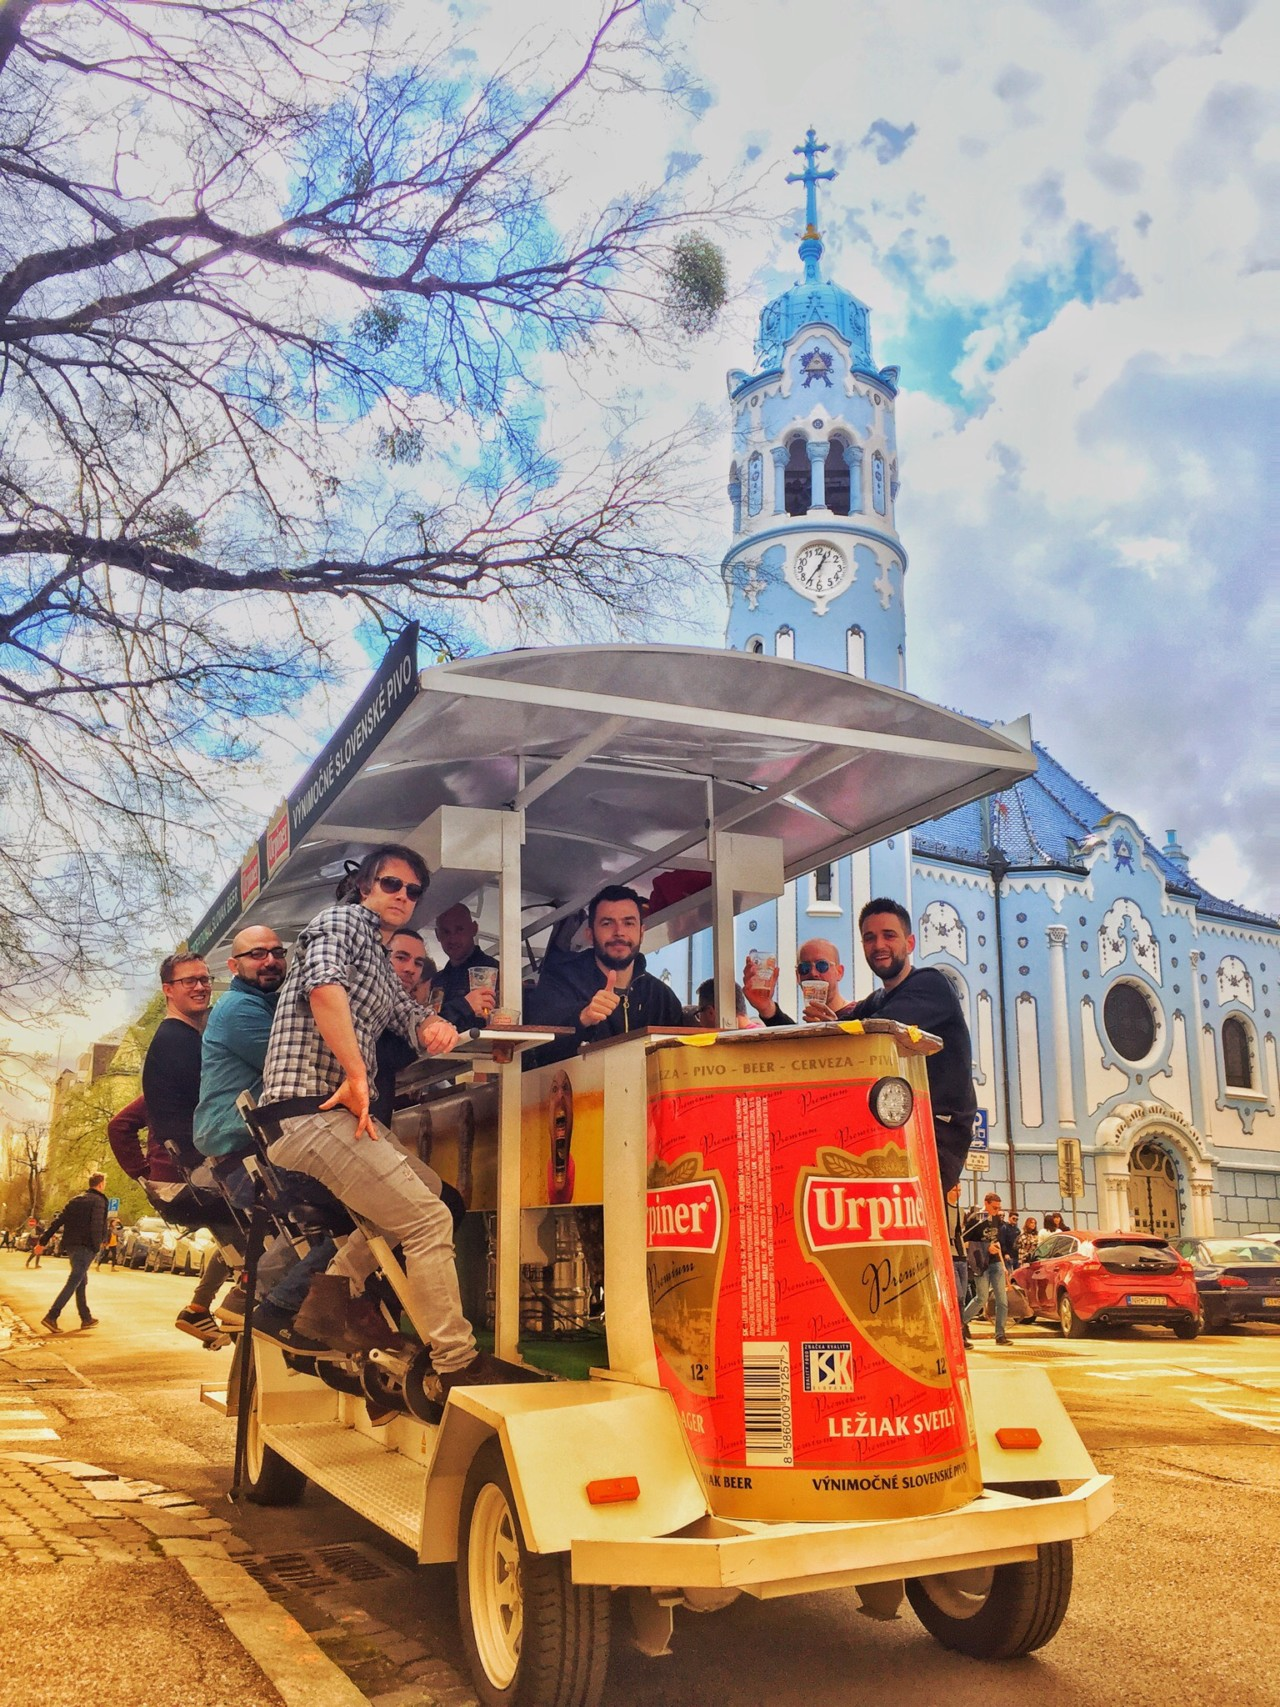 Krnoul/Beer Bike Bratislava